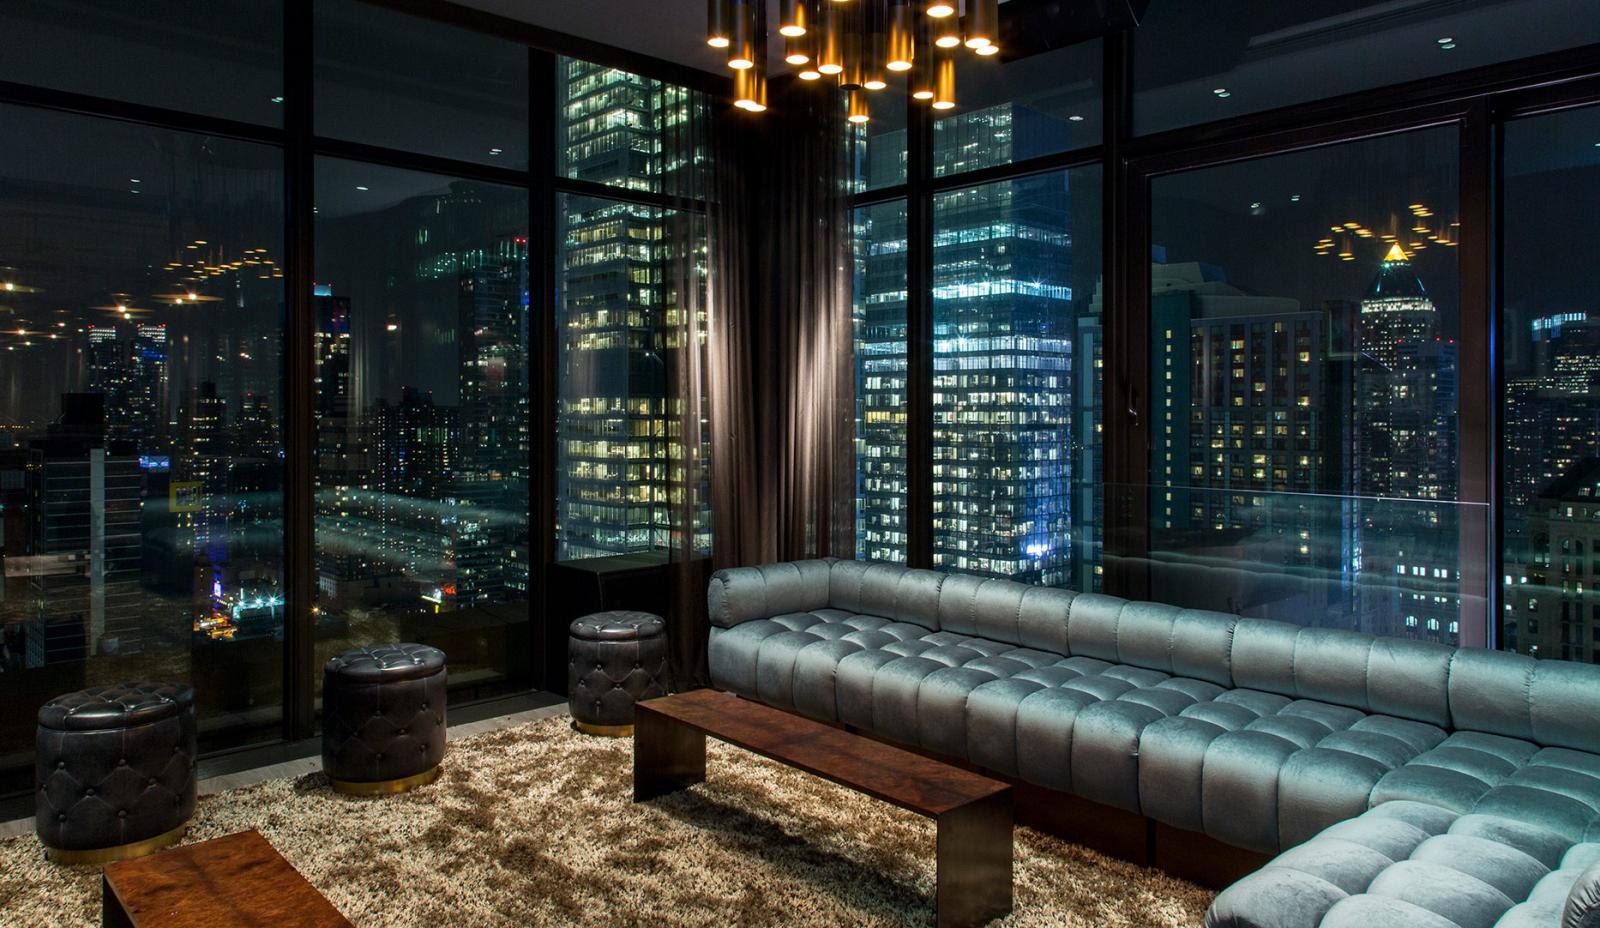 The Skylark Rooftop Bar 05